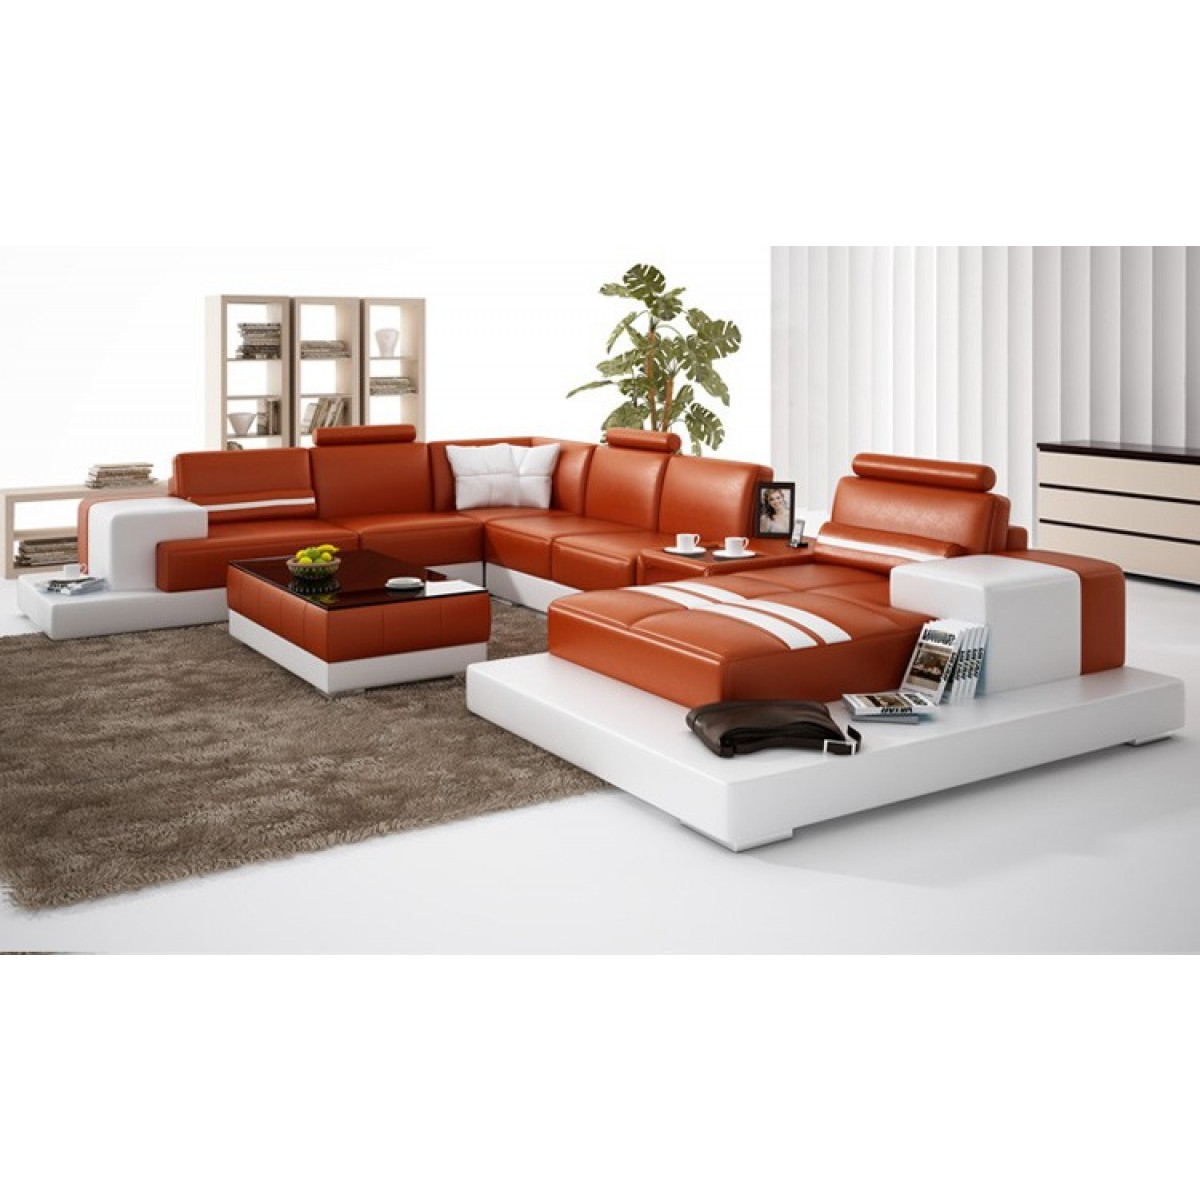 canap d 39 angle panoramique en cuir v ritable pino pop. Black Bedroom Furniture Sets. Home Design Ideas